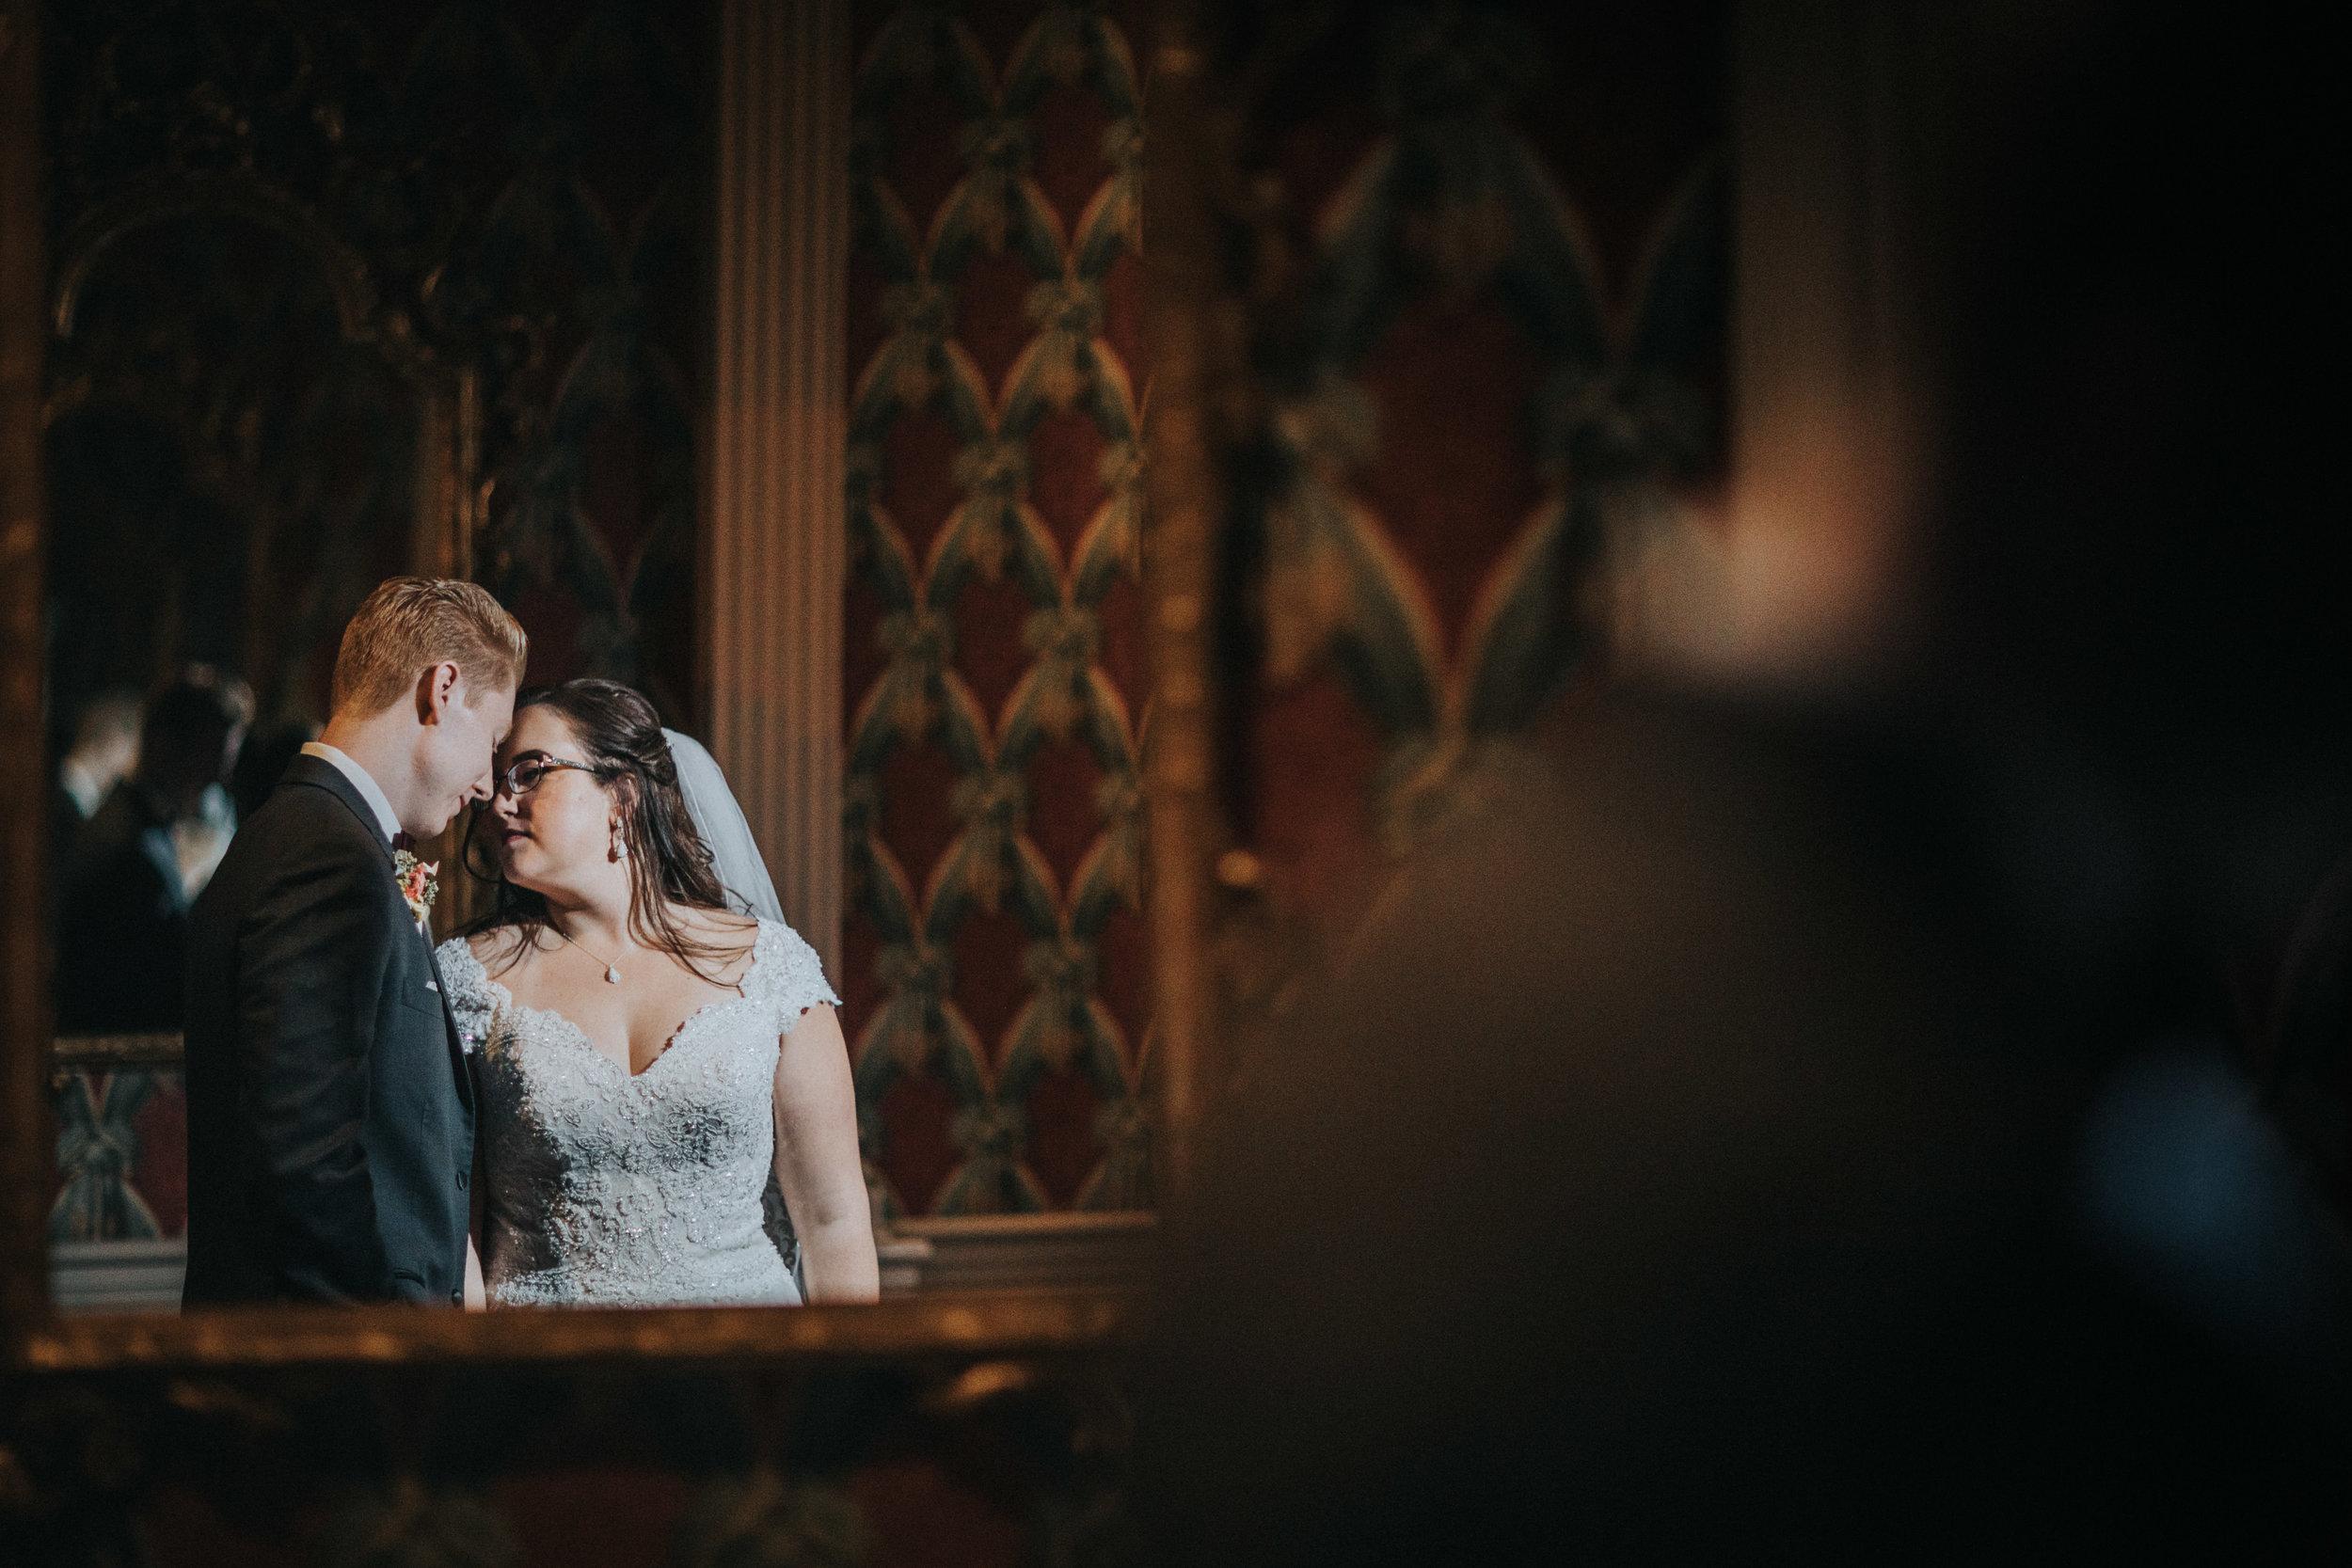 New-Jersey-Wedding-Photography-Fishers-Tudor-House-JennaLynnPhotography-Bride&Groom-Kathleen&Eddie-28.jpg